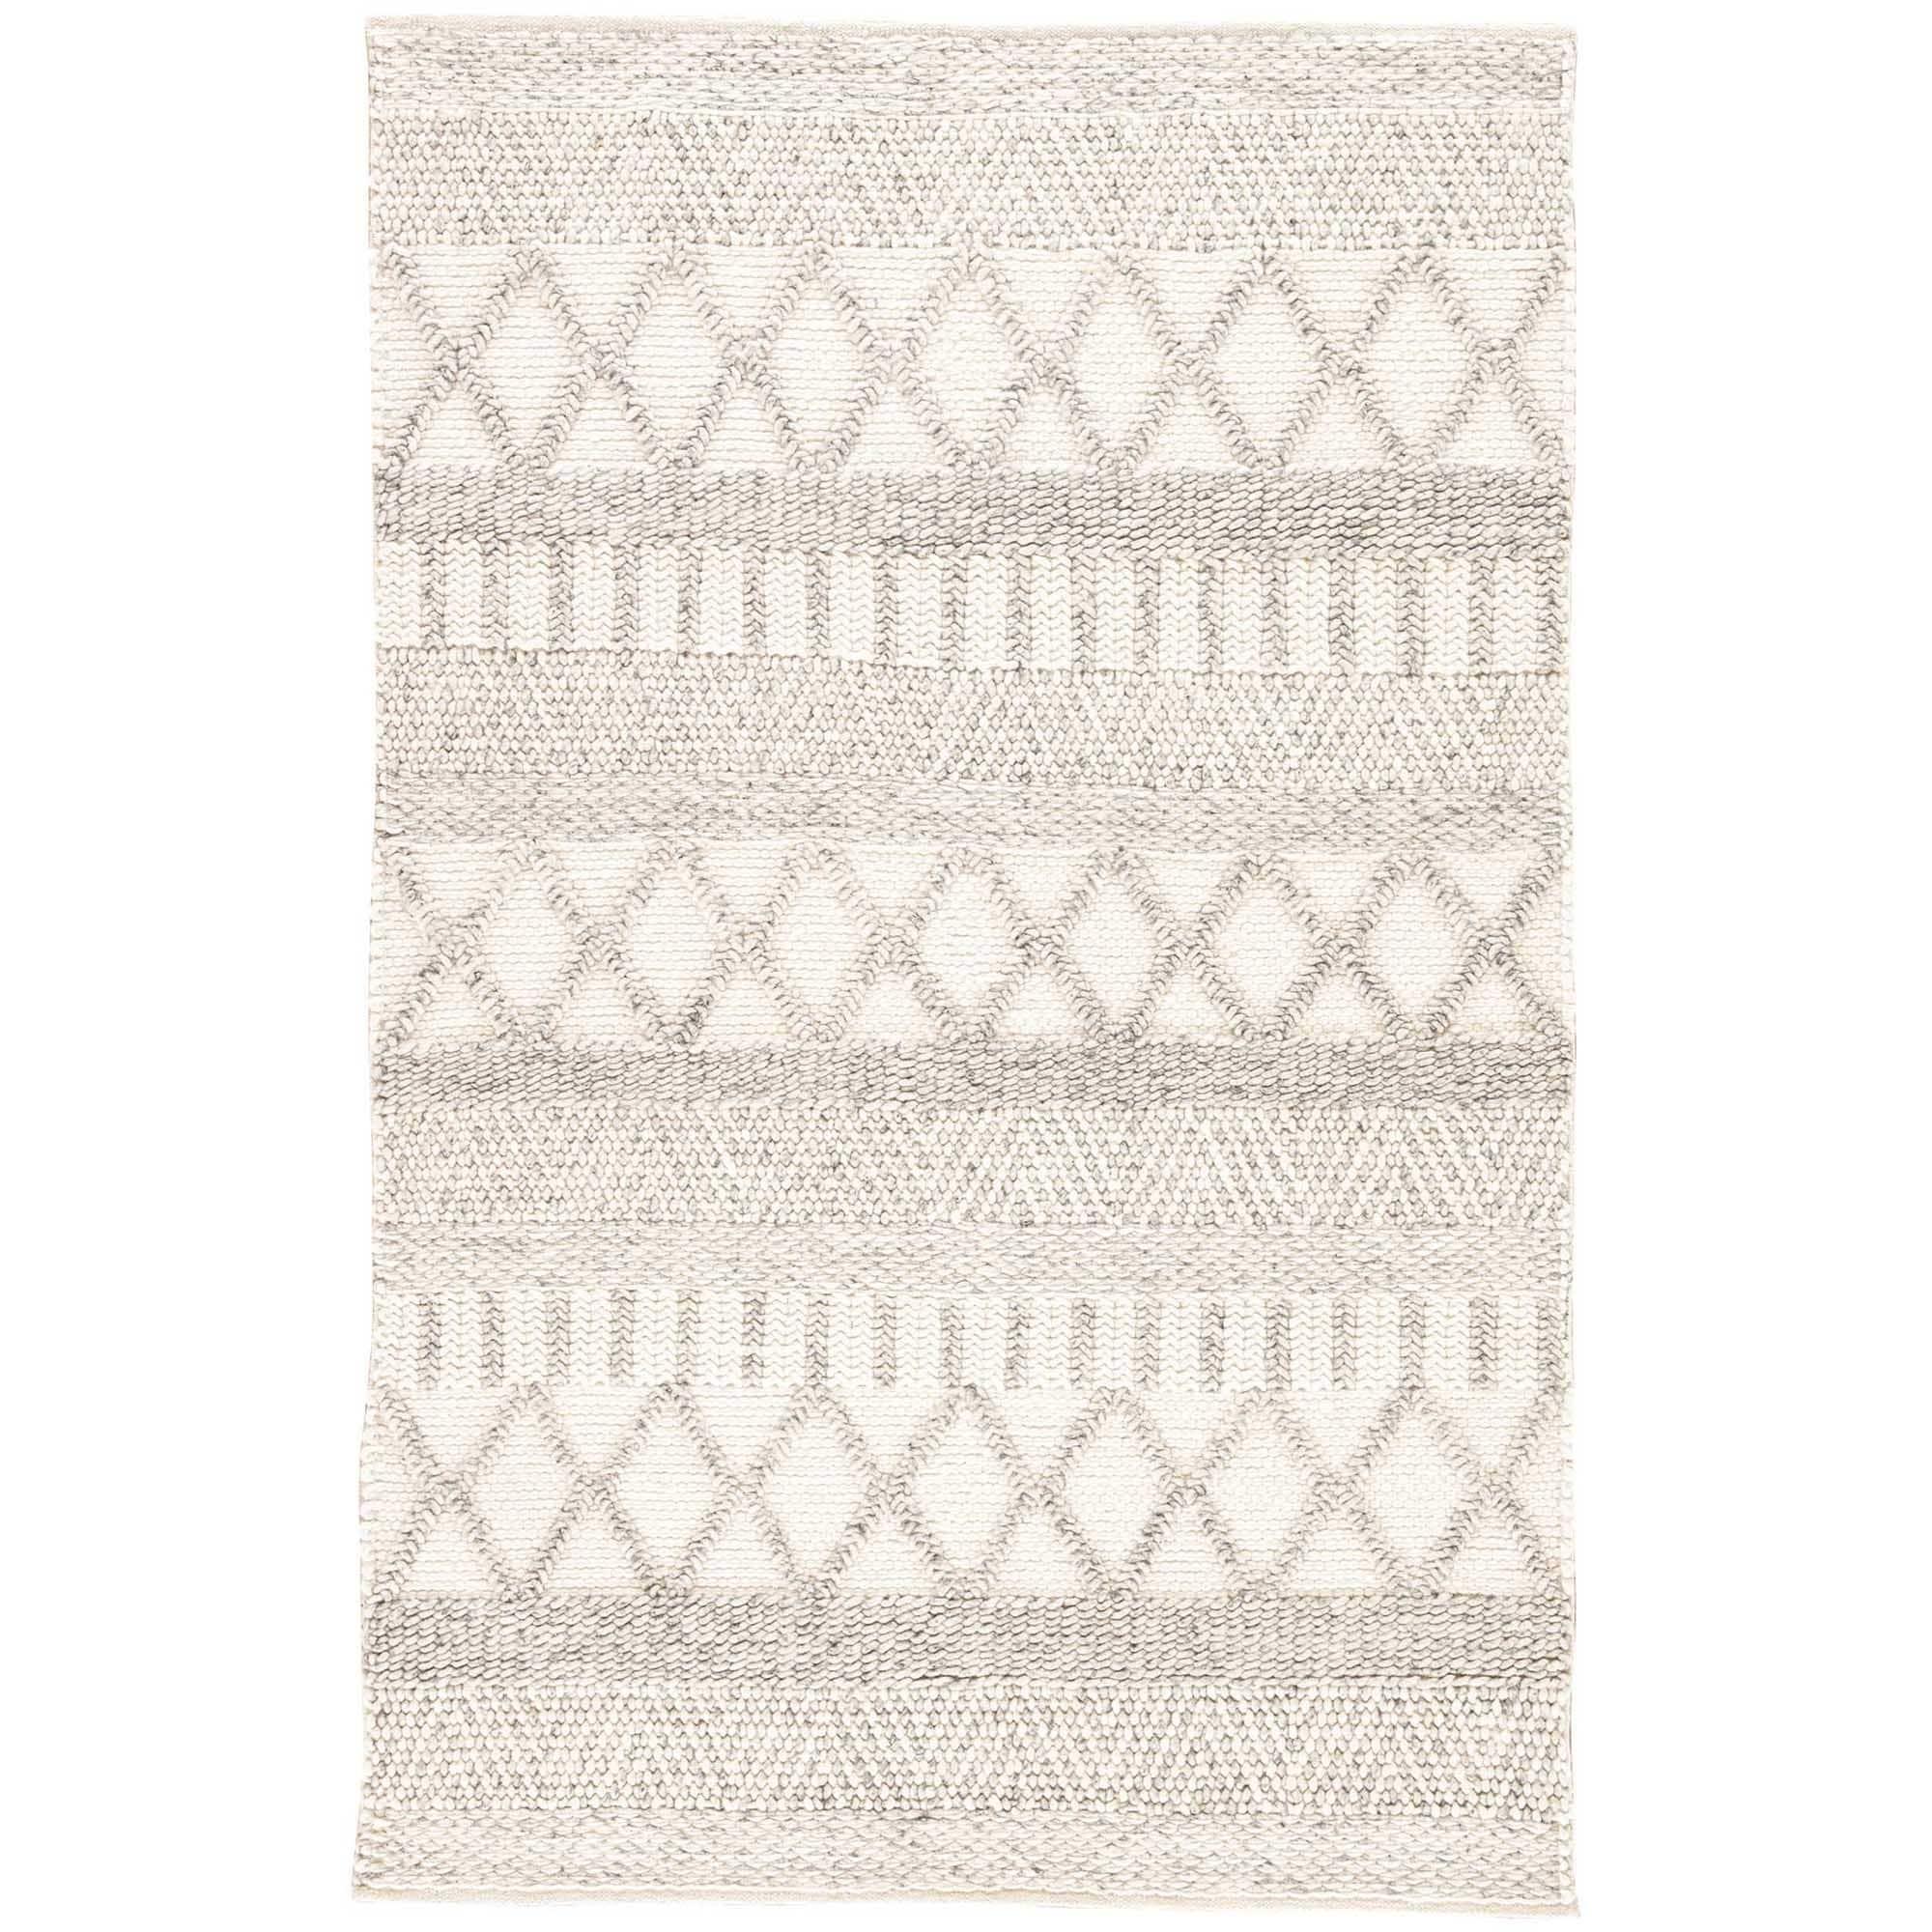 Shop Janson Handmade Geometric Gray White Area Rug 8 X 10 On